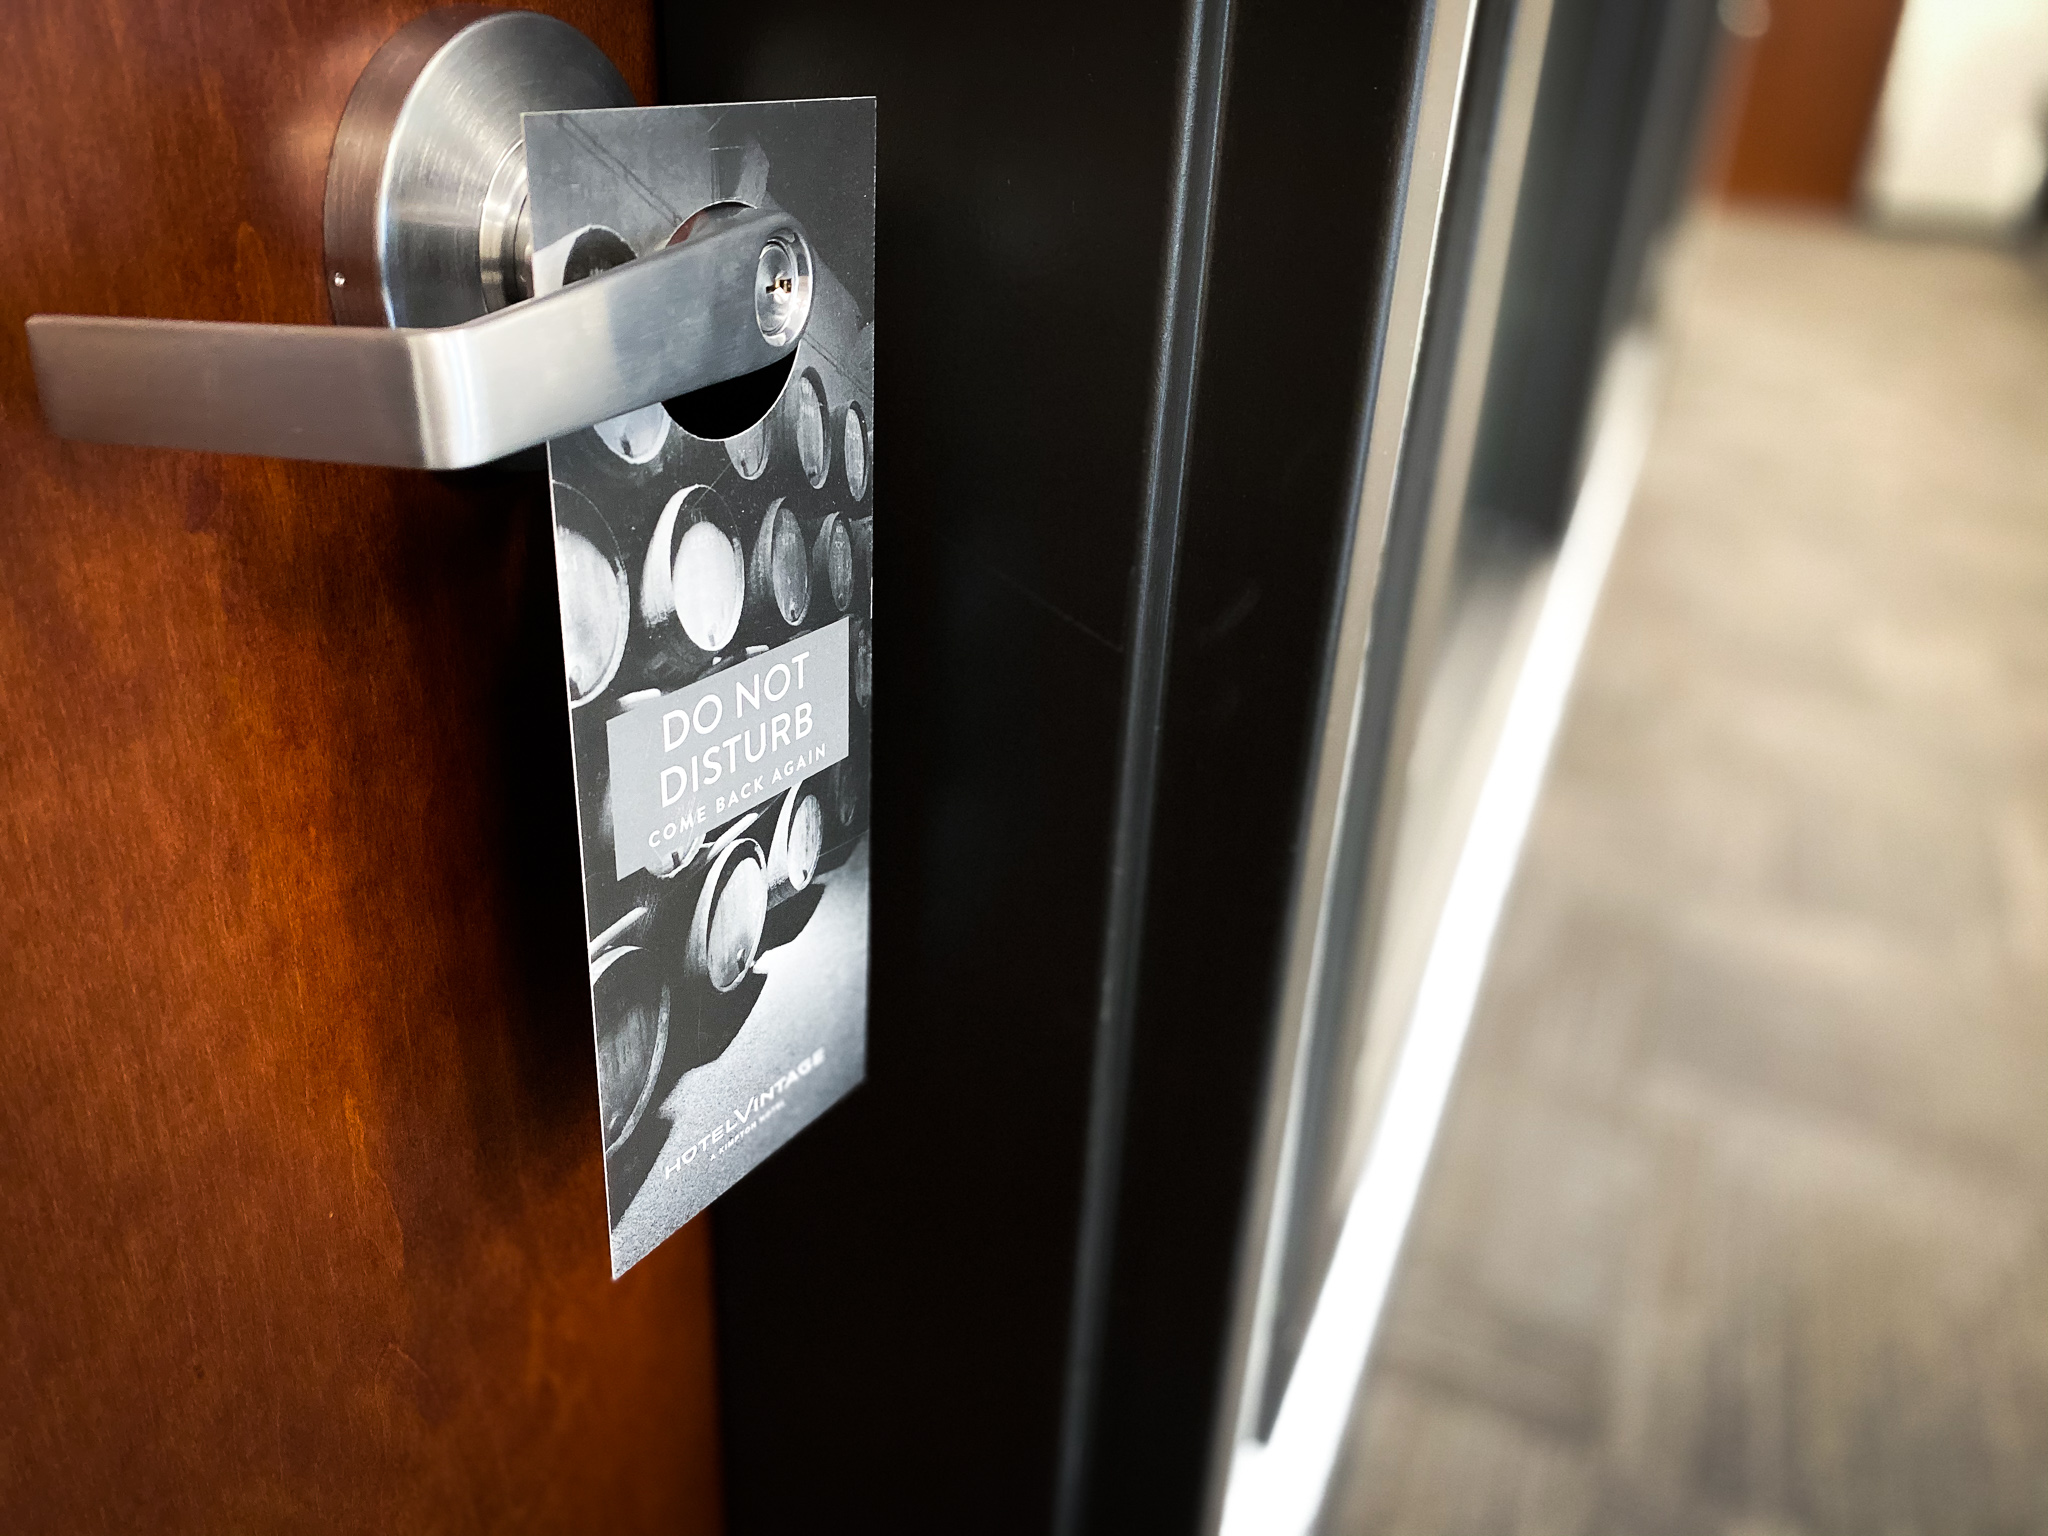 Door hang tag for hotels